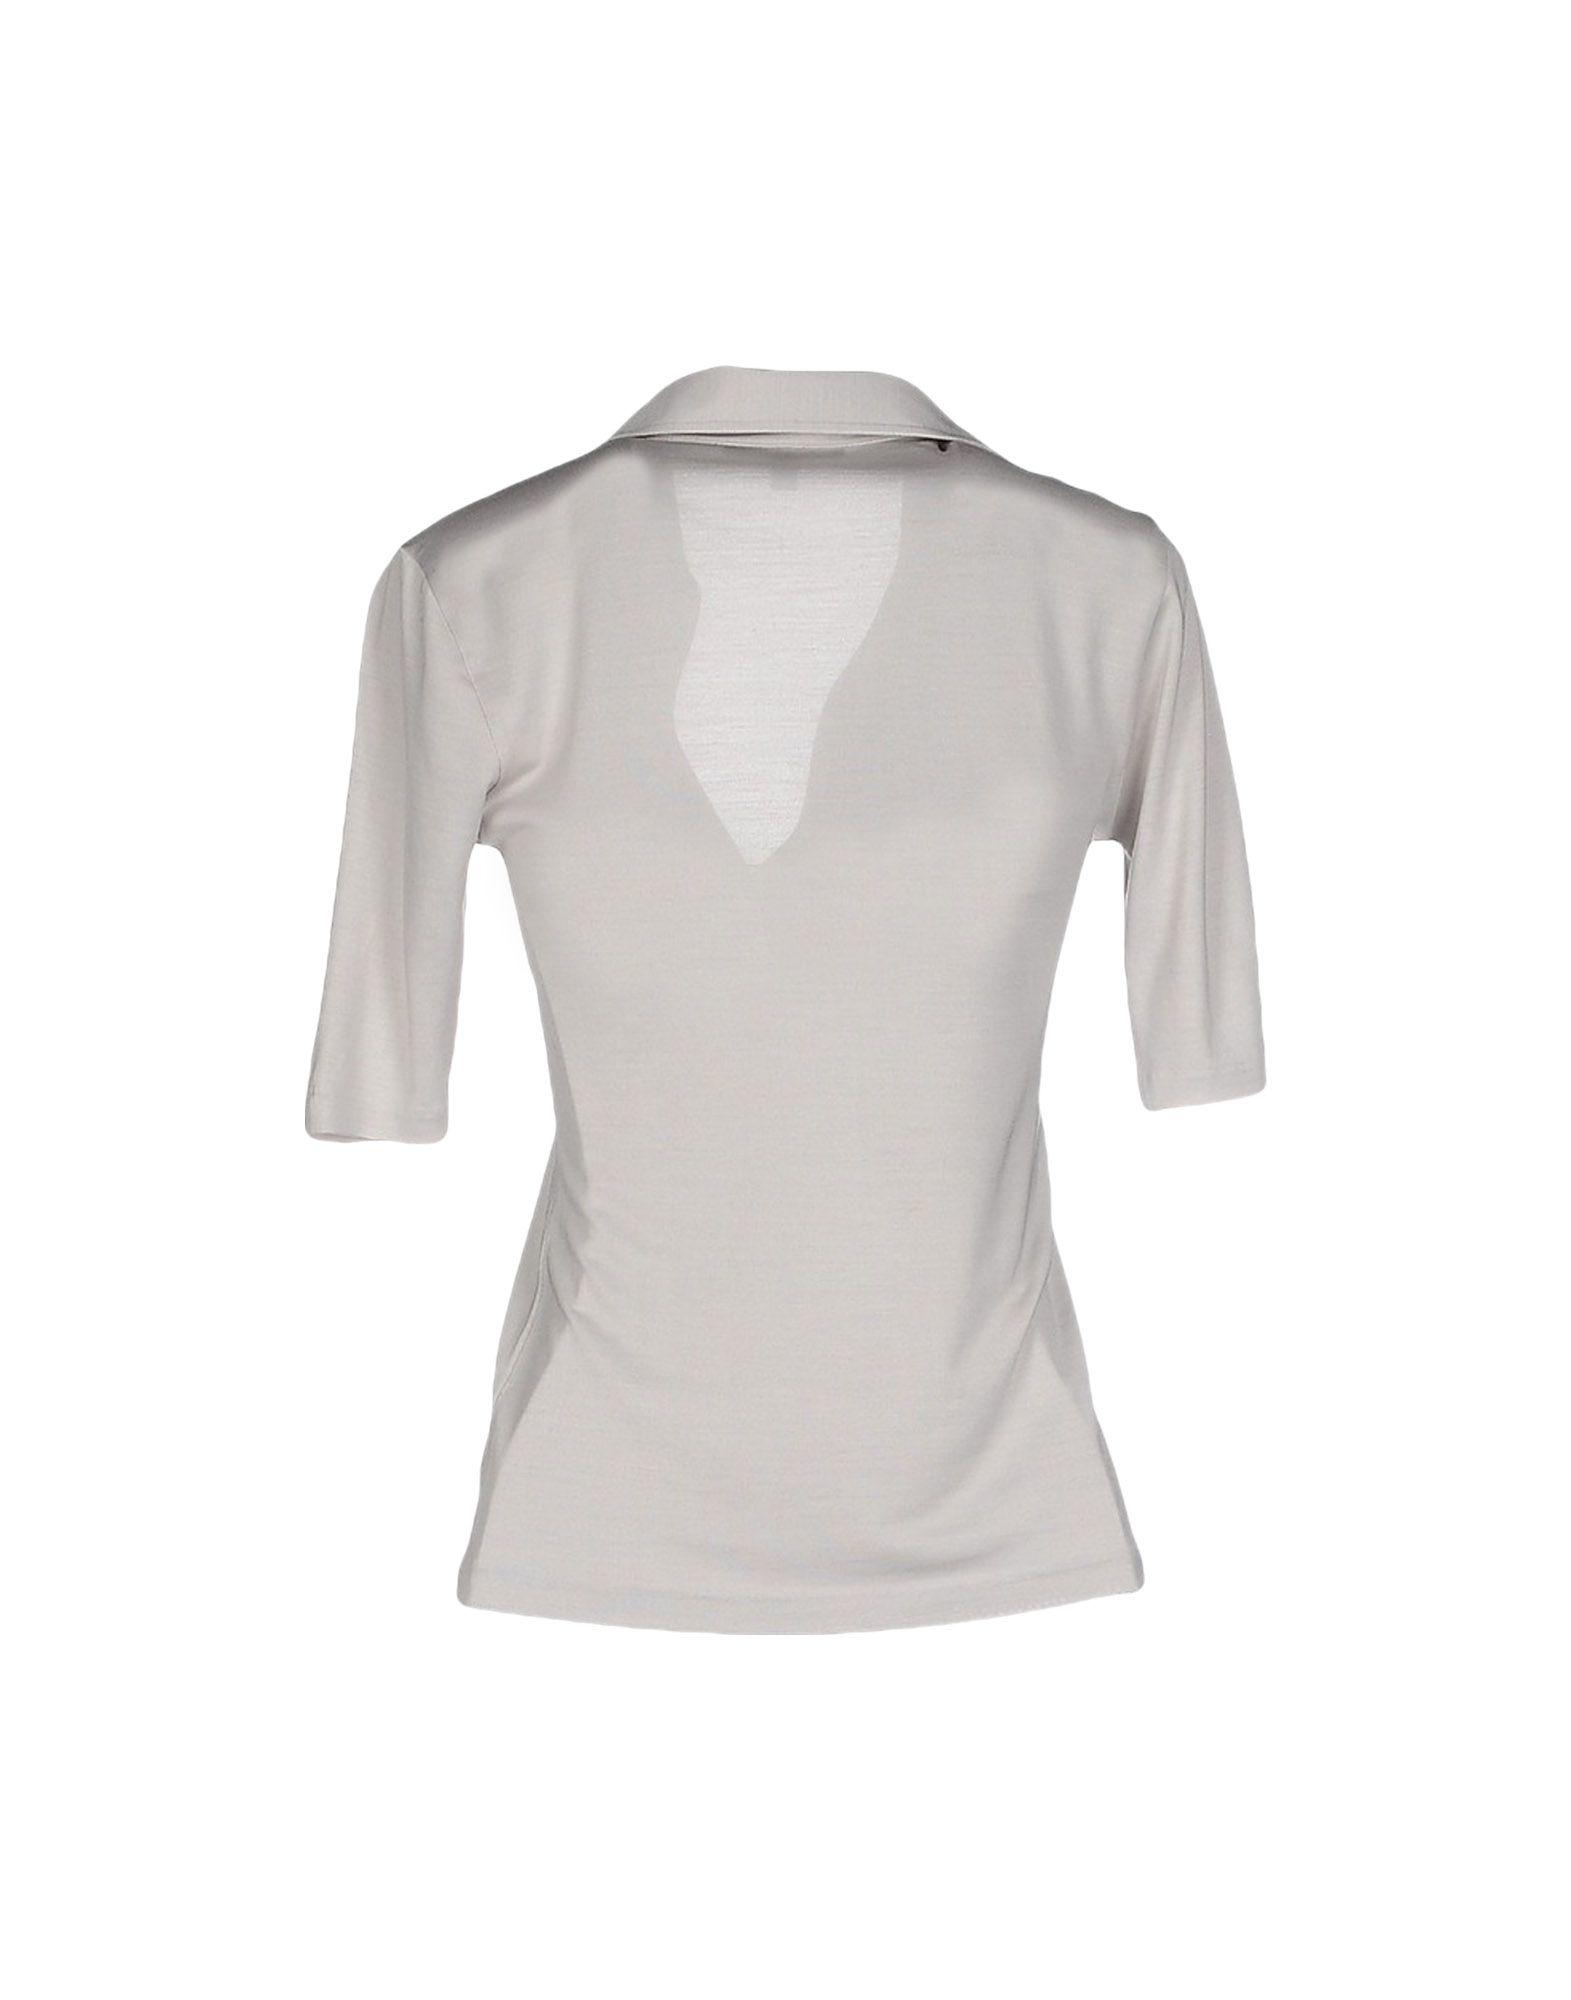 Ralph lauren black label polo shirt in gray lyst for Ralph lauren black label polo shirt